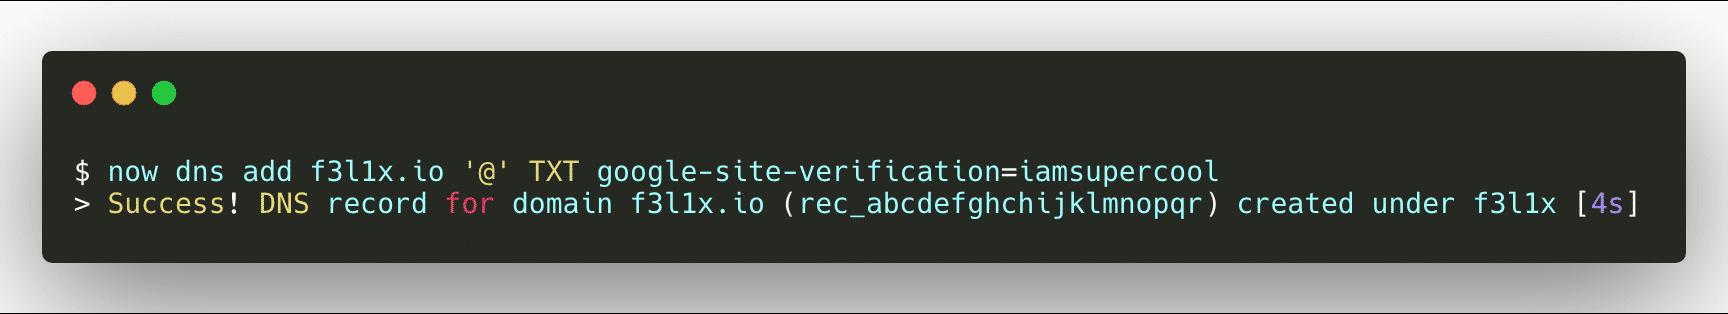 ZEIT DNS - Add new DNS record